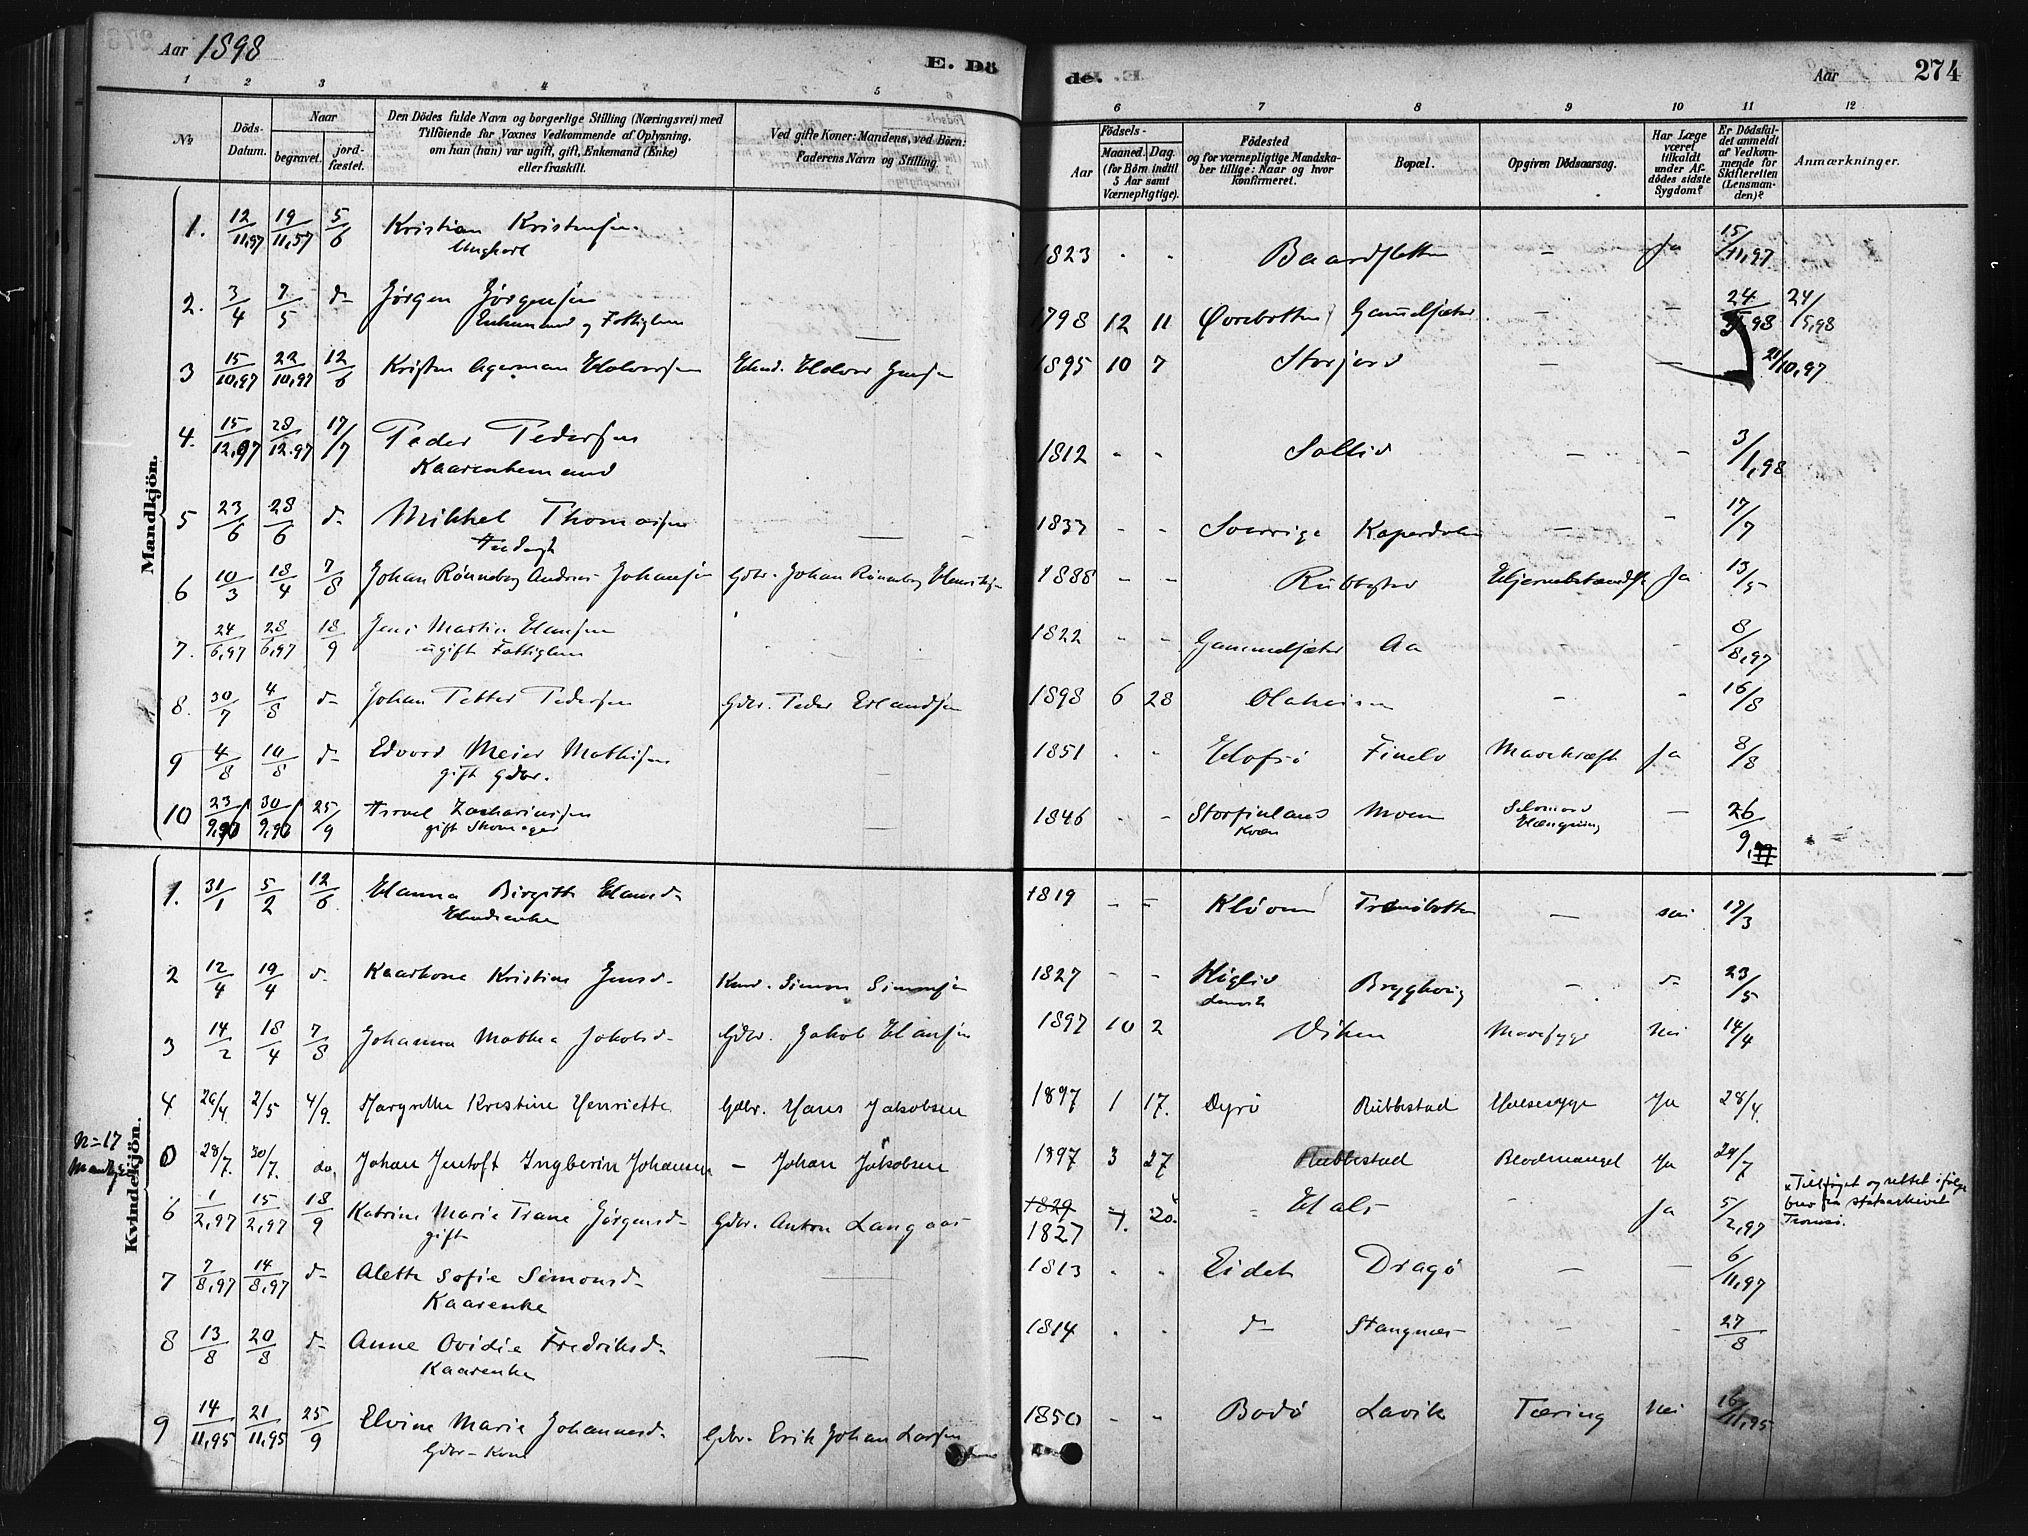 SATØ, Tranøy sokneprestkontor, I/Ia/Iaa/L0009kirke: Ministerialbok nr. 9, 1878-1904, s. 274